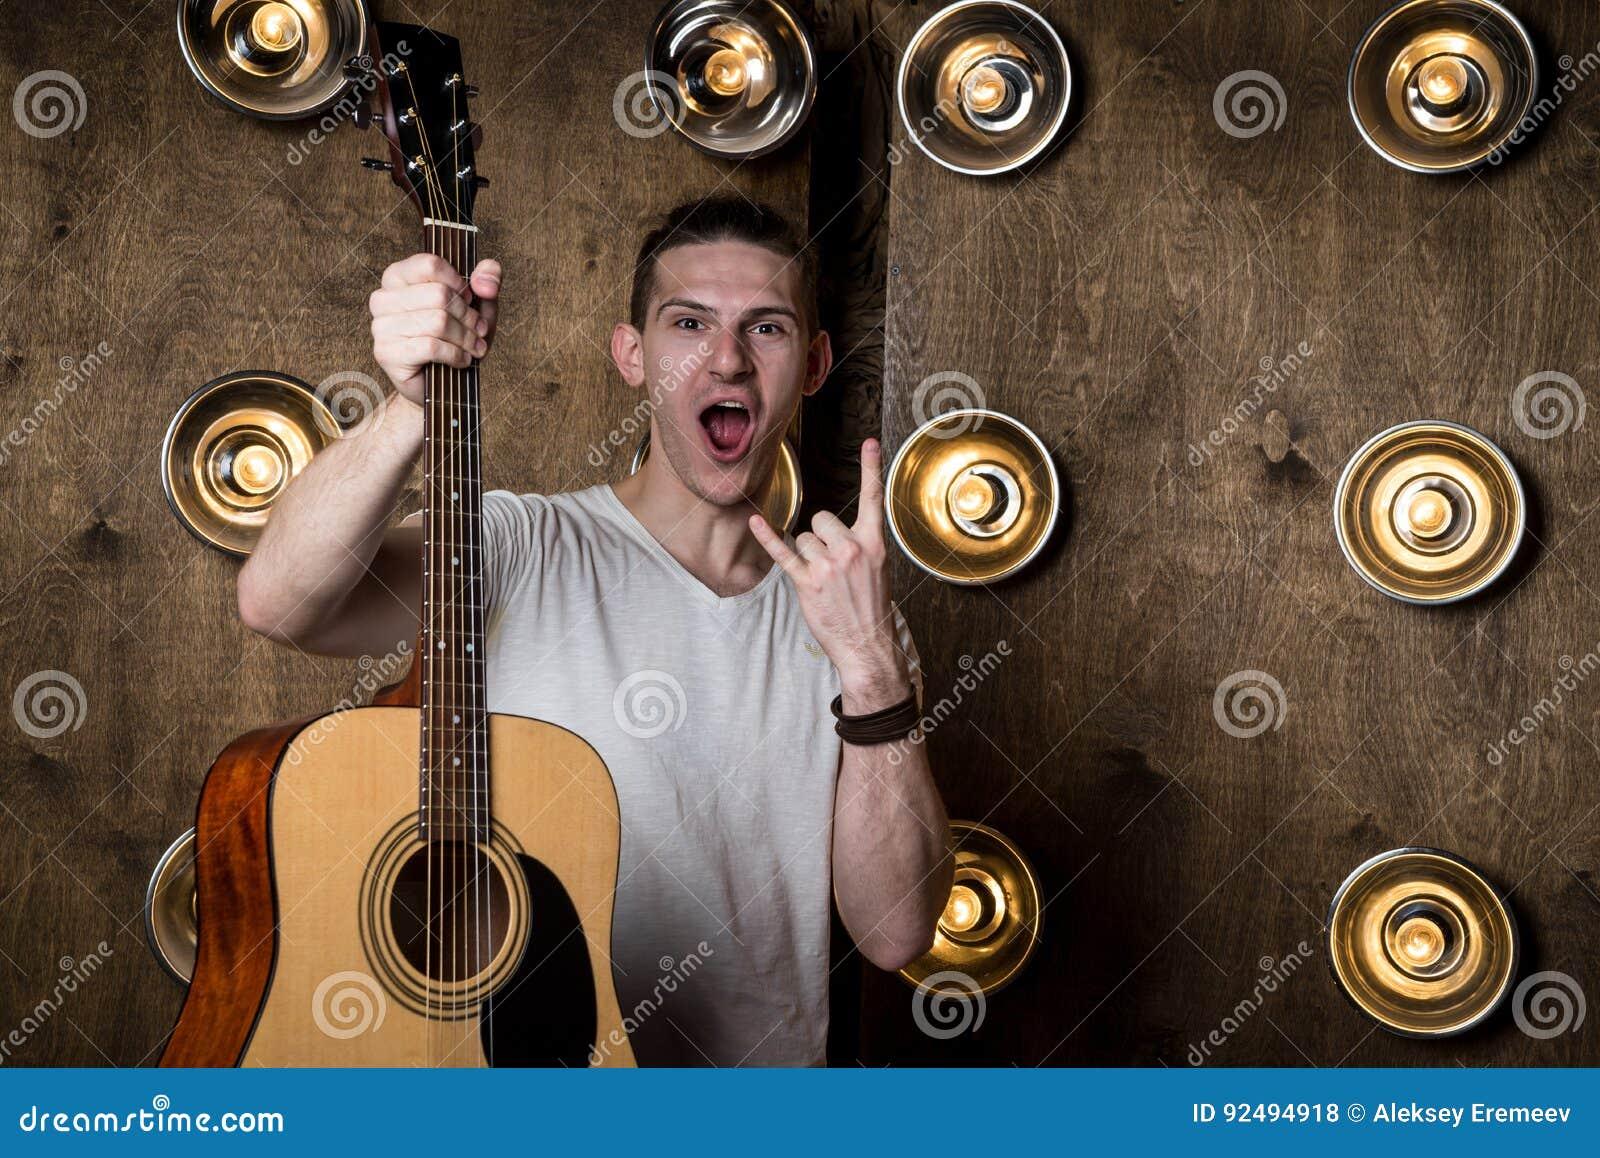 Guitarist Hand Playing Guitar Chords Am C Em E Royalty